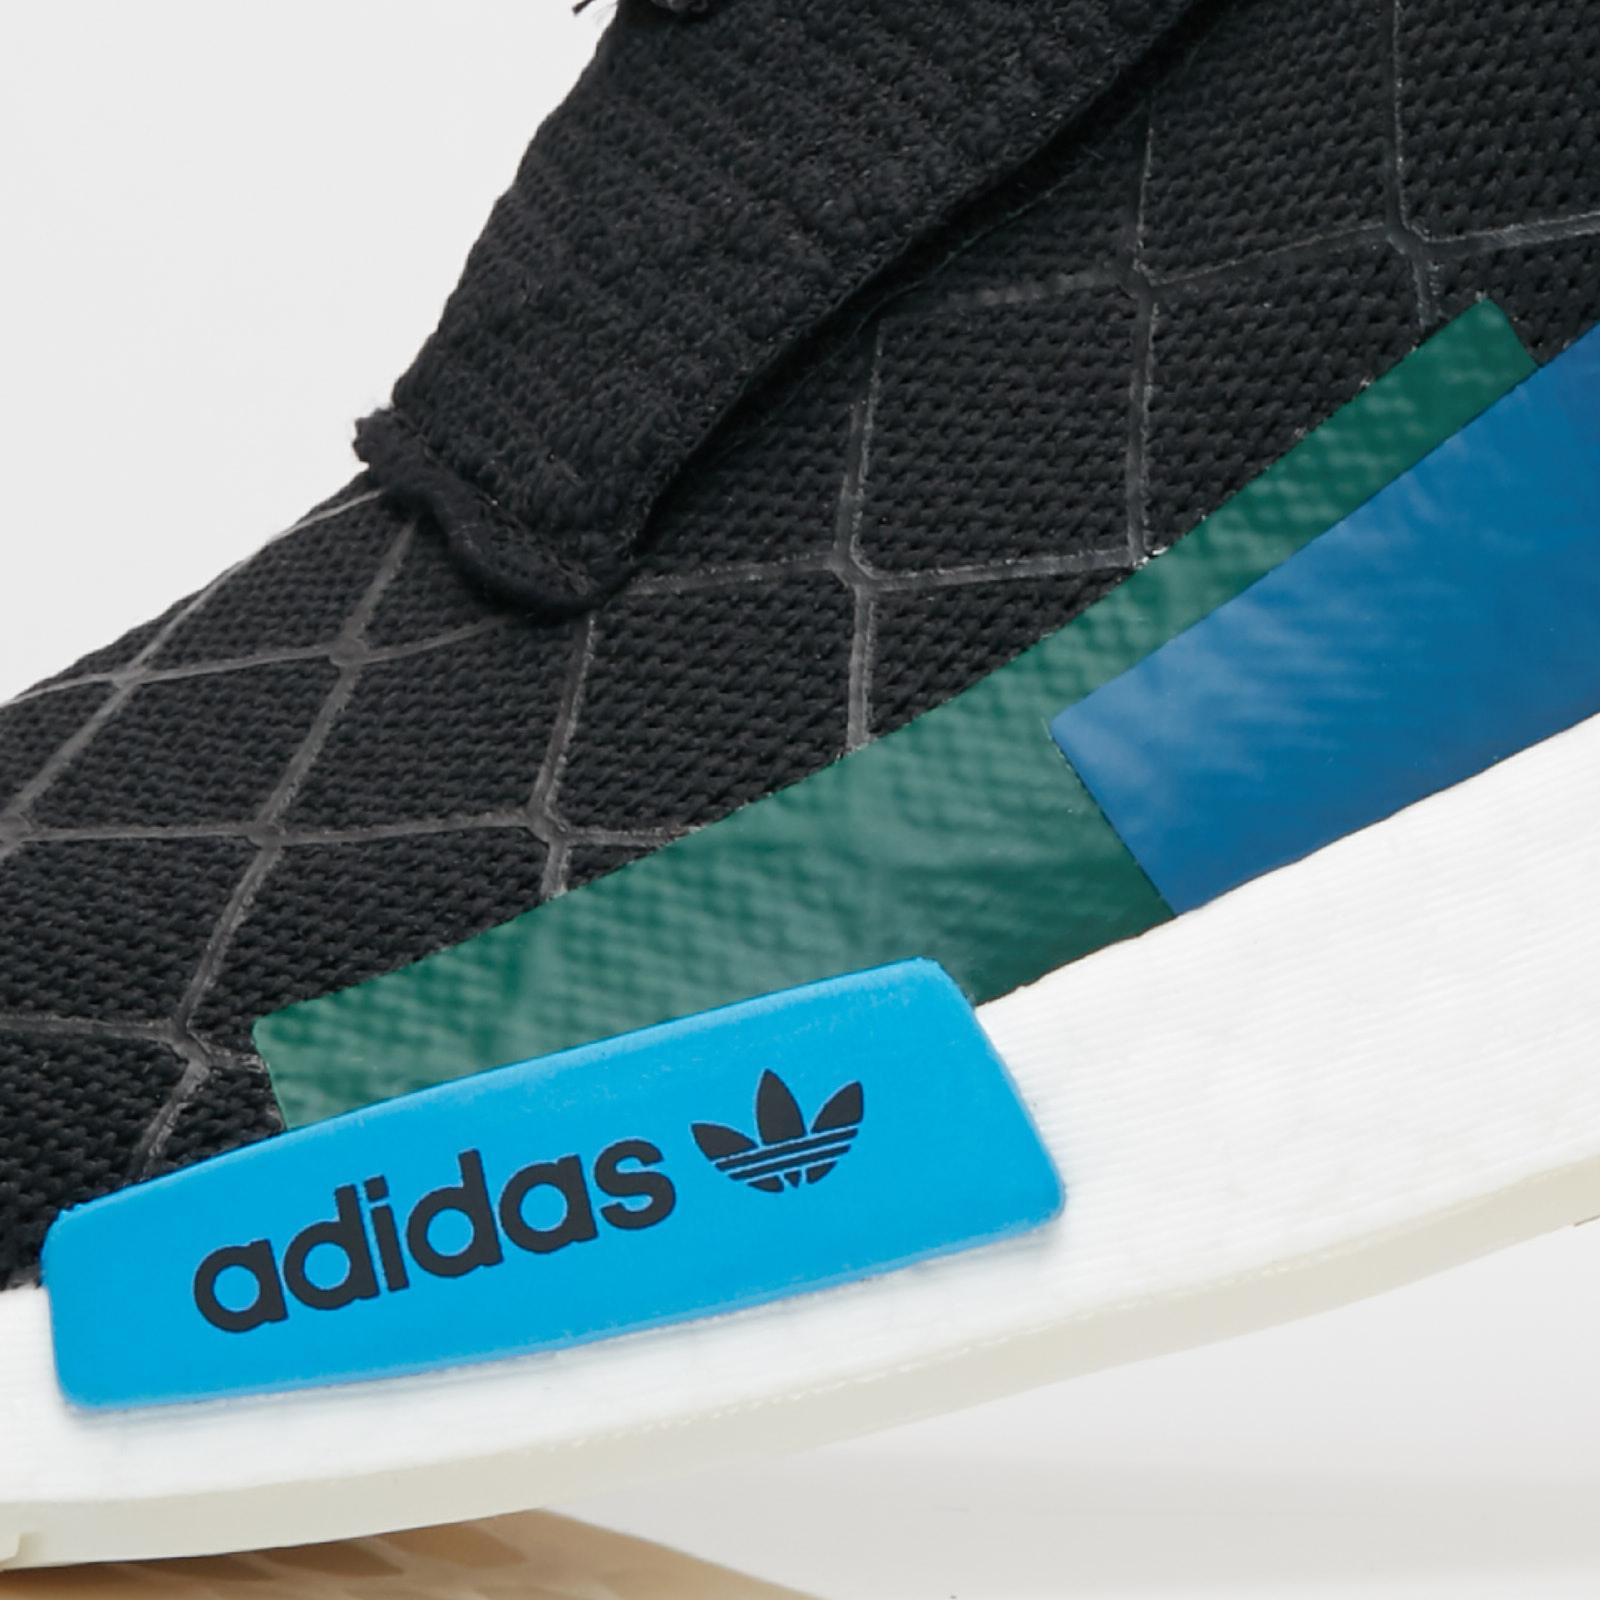 Sneakers Mita Seeulater Seeulater Sneakers Mita Adidas Adidas qqvrFanC5w